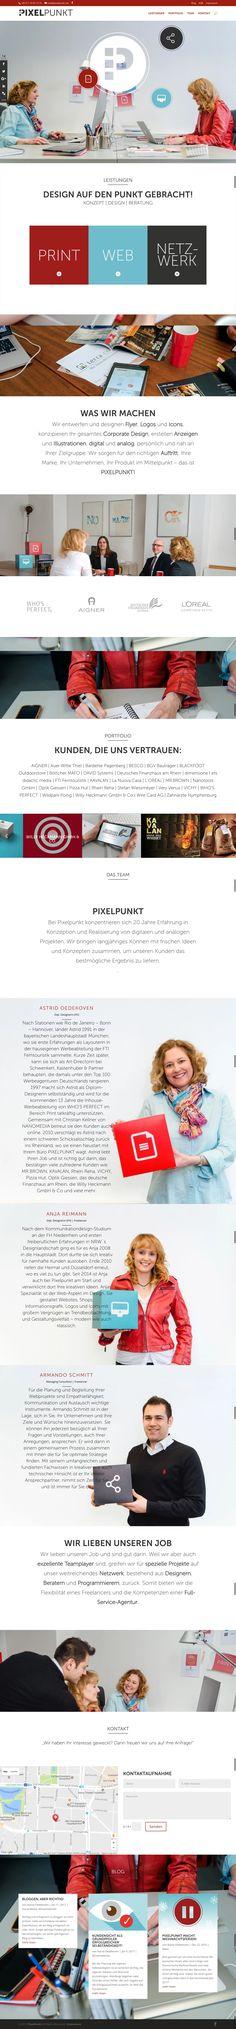 PixelPunkt Website Designs, Web Inspiration, Wordpress Theme, Web Design, Advertising Agency, Design Web, Site Design, Wordpress Template, Design Websites